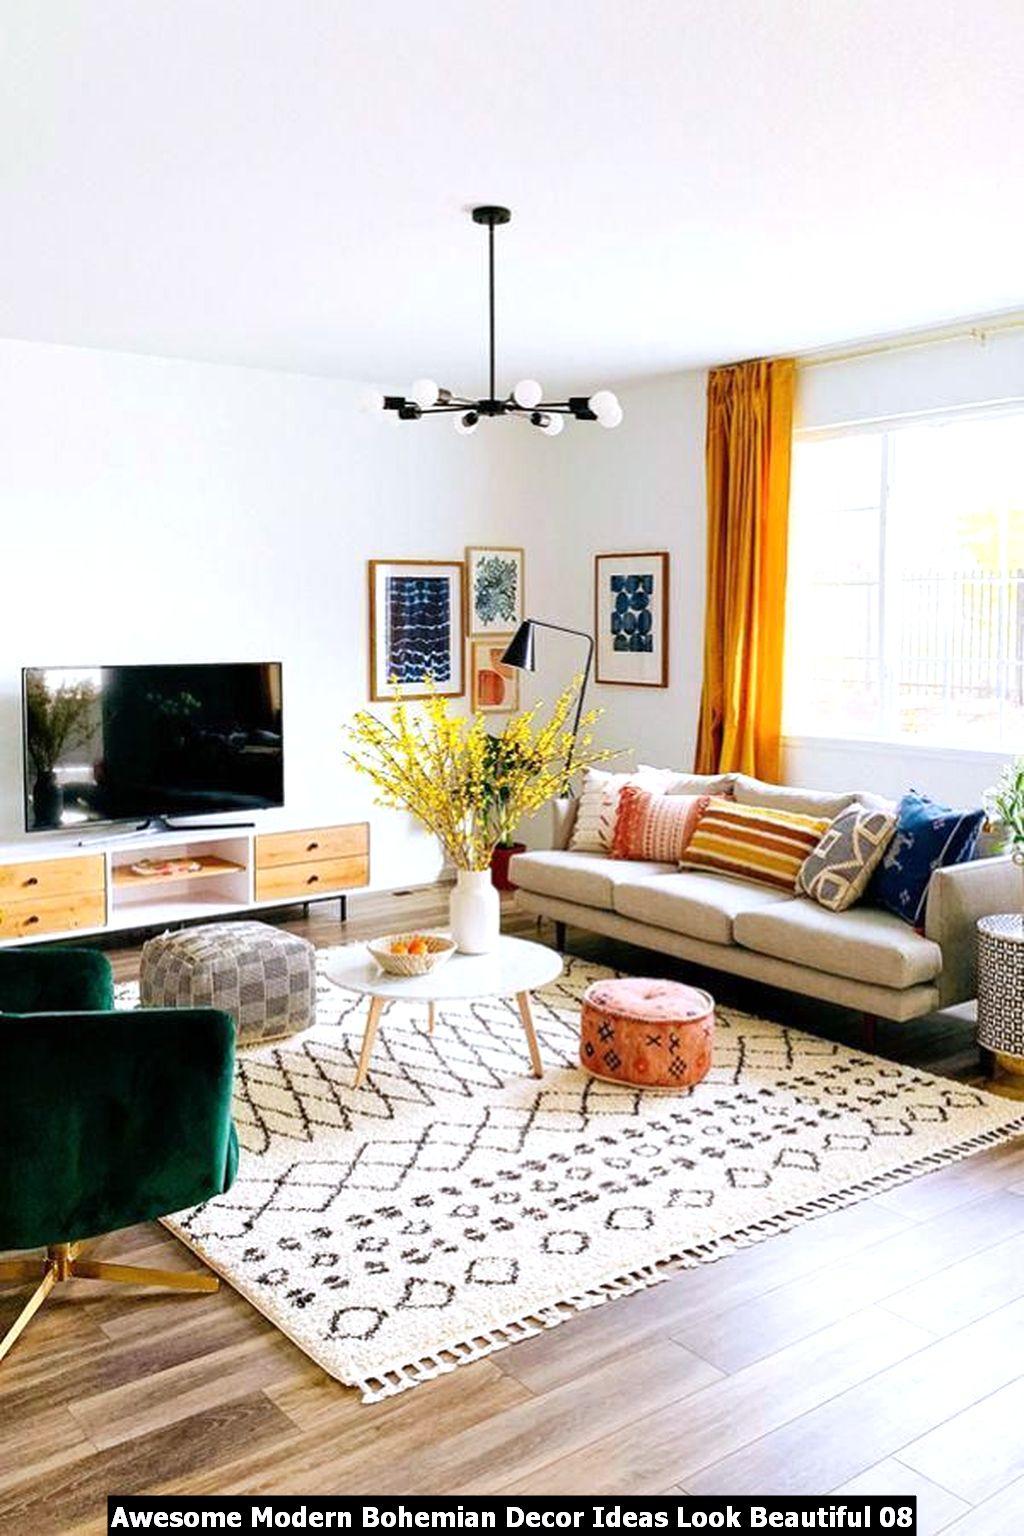 Awesome Modern Bohemian Decor Ideas Look Beautiful 08